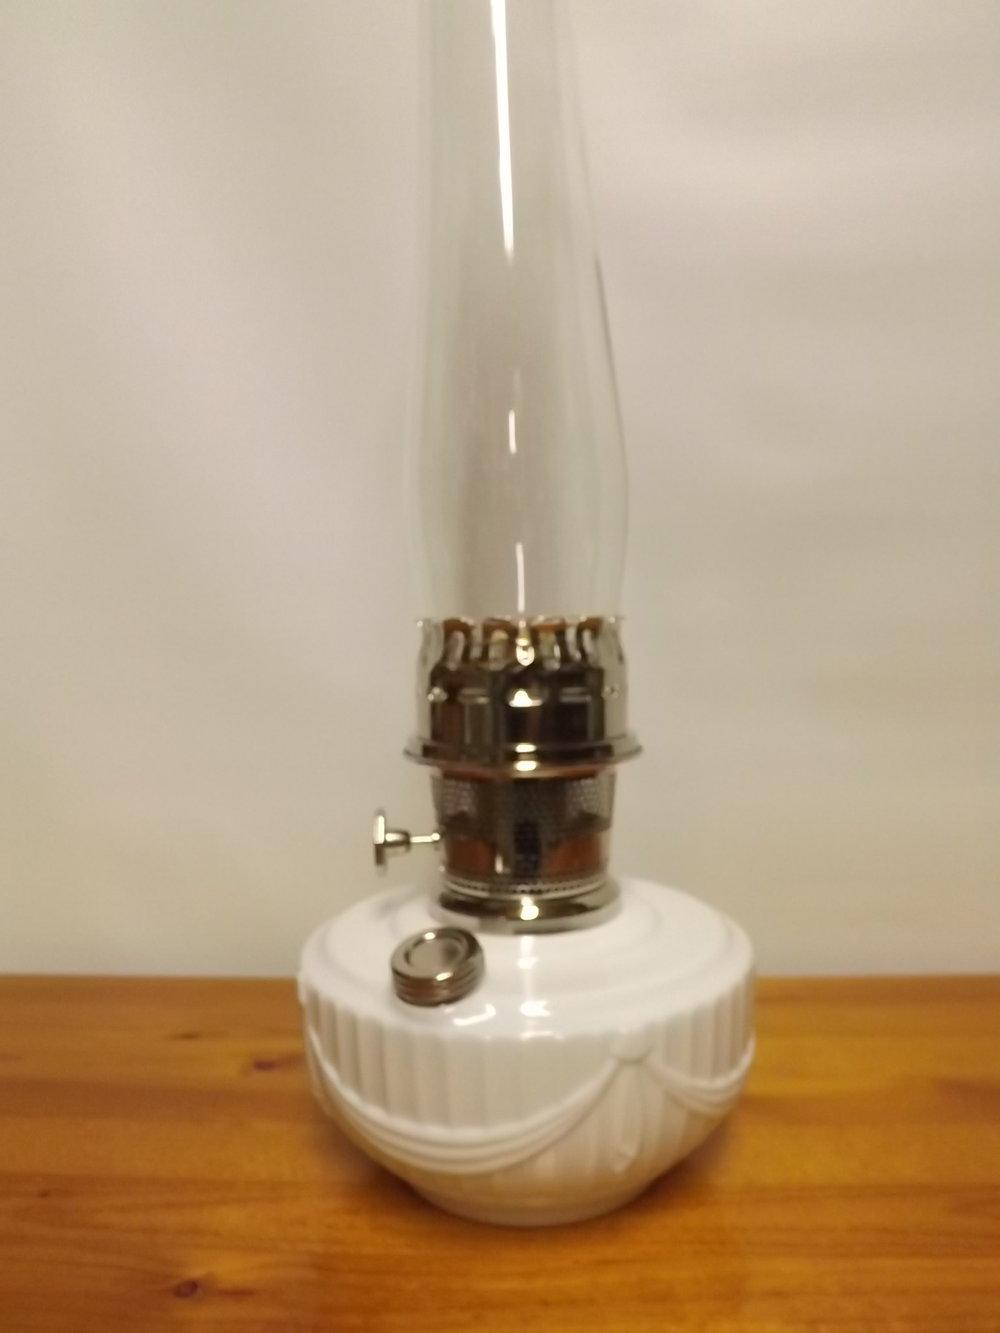 SL101 - Shelf Lamp